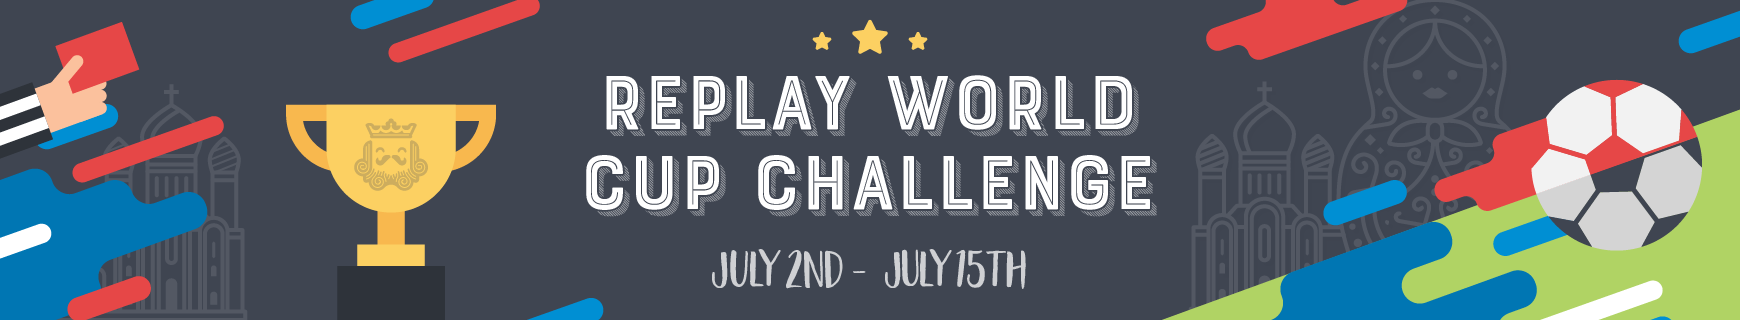 Replay world cup challenge %28870 x 160%29 2x %281%29